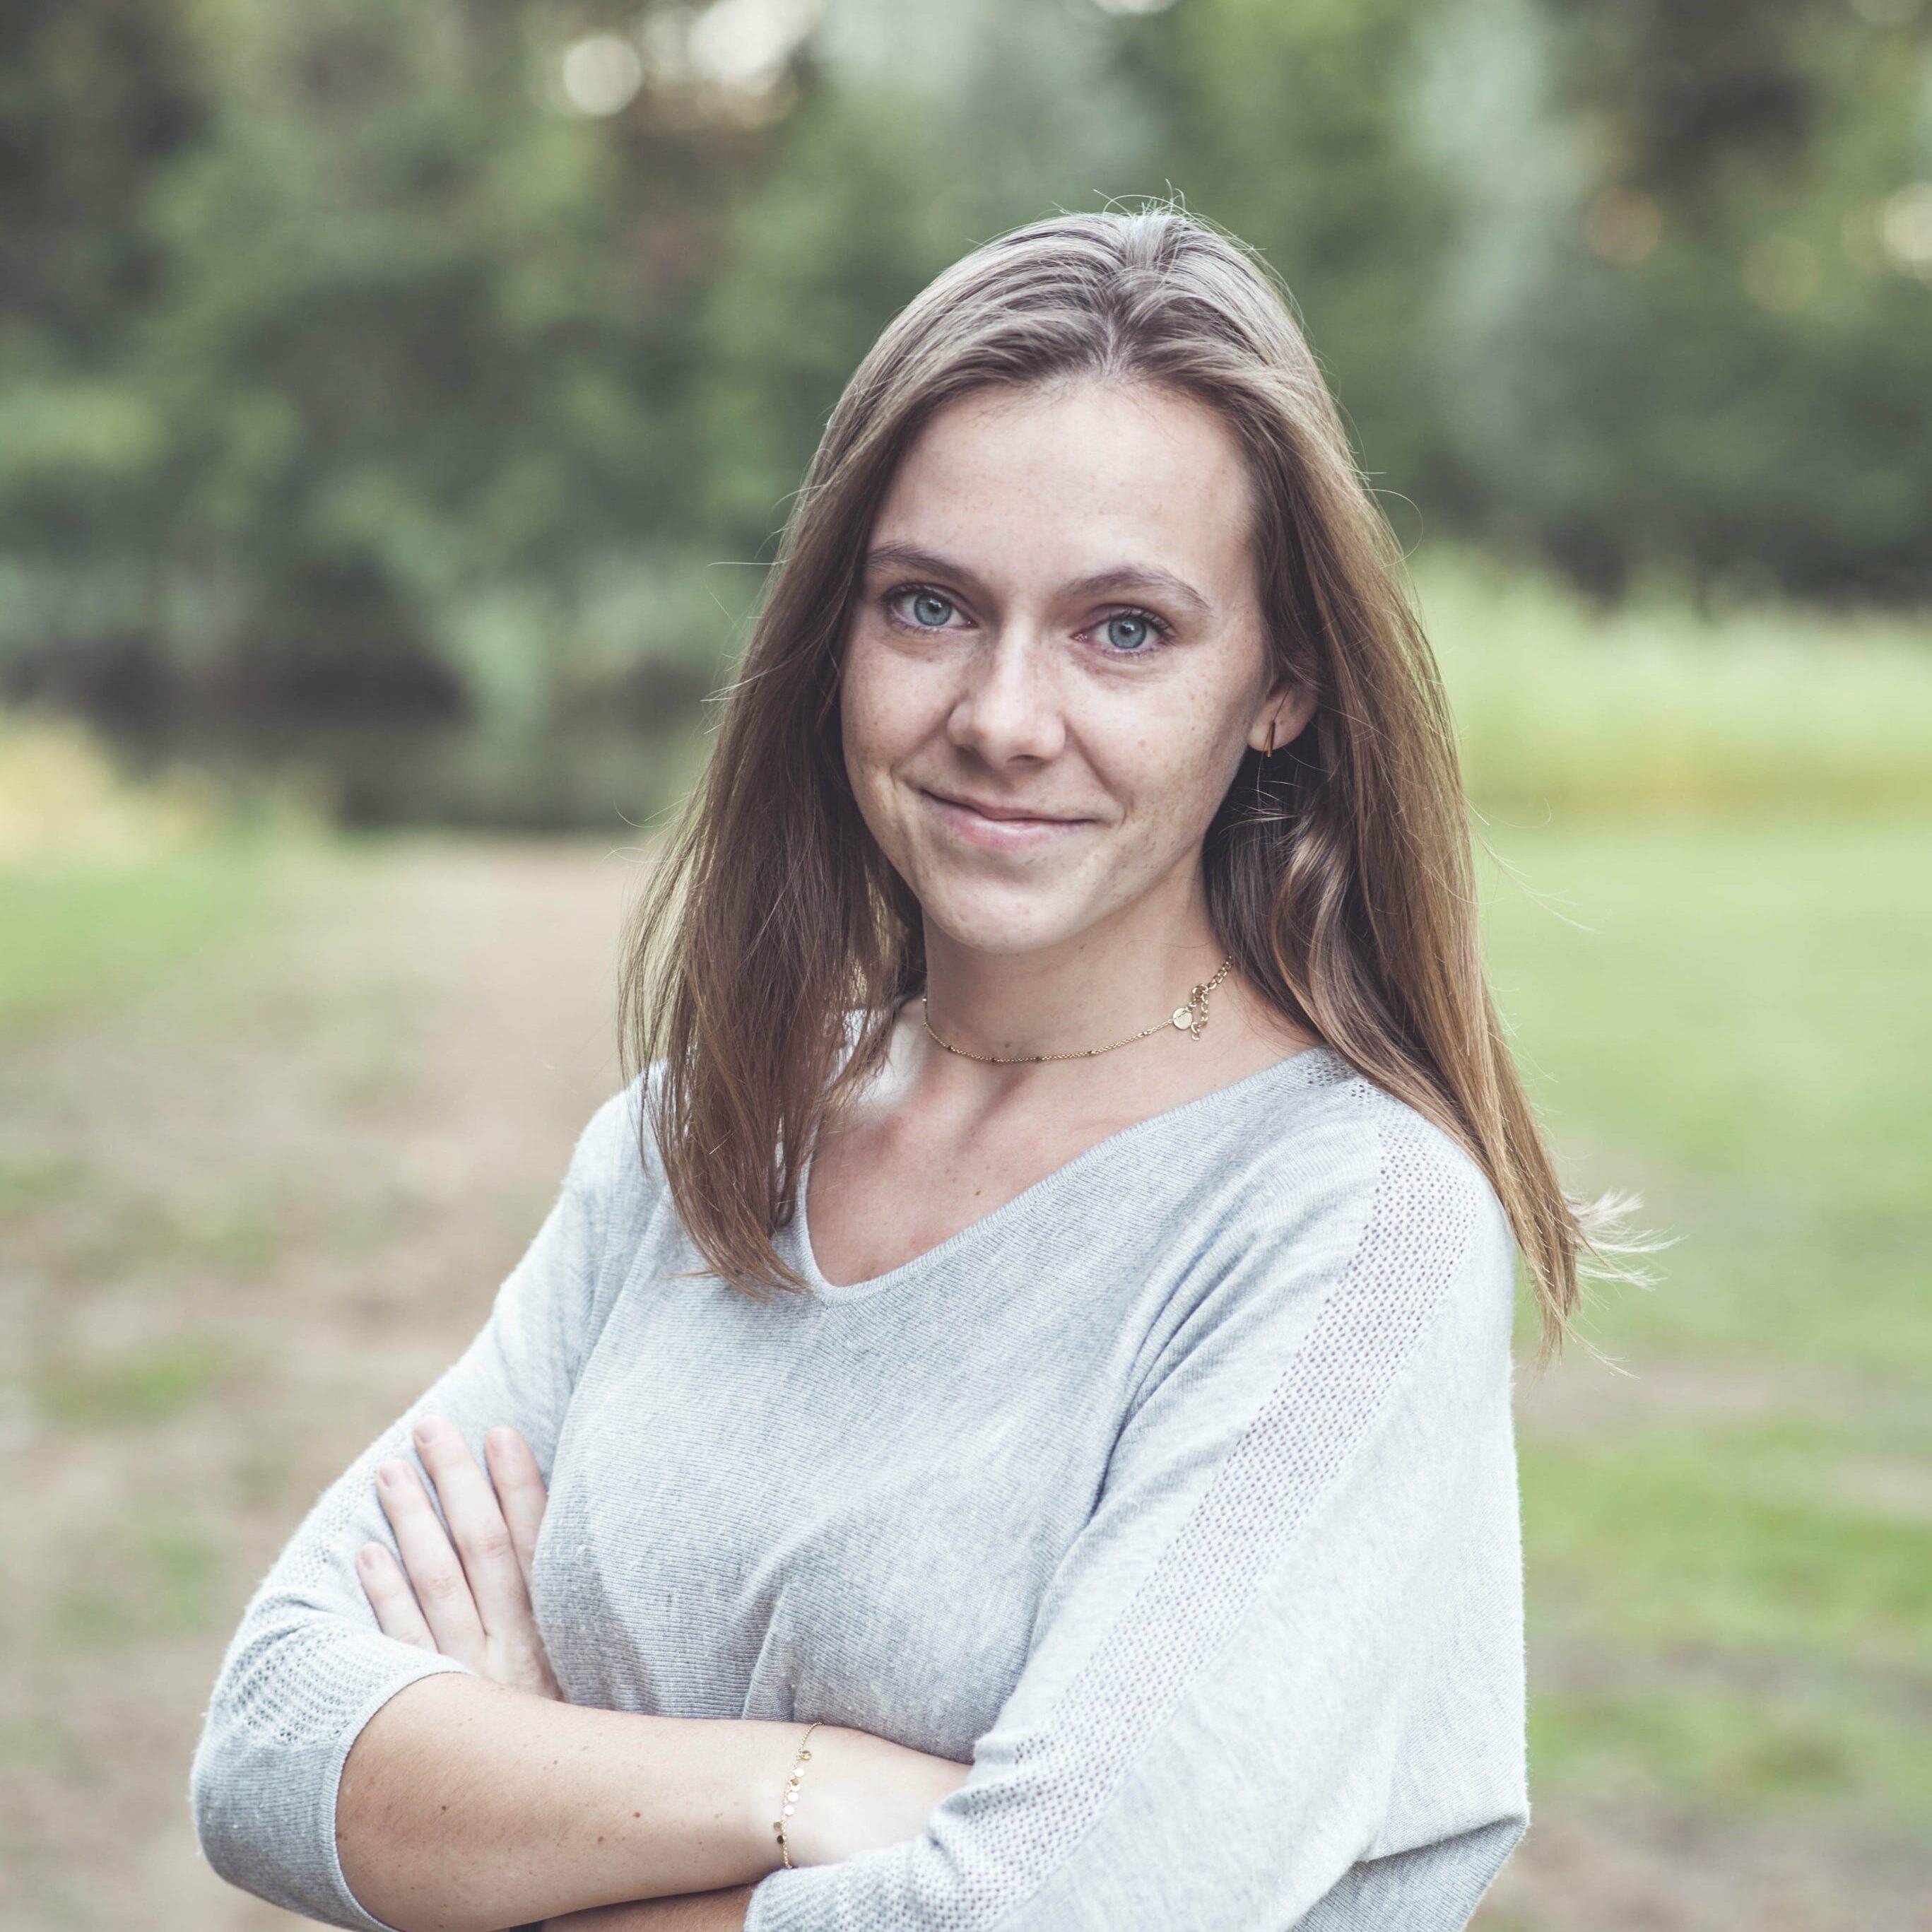 Hanne Beyls